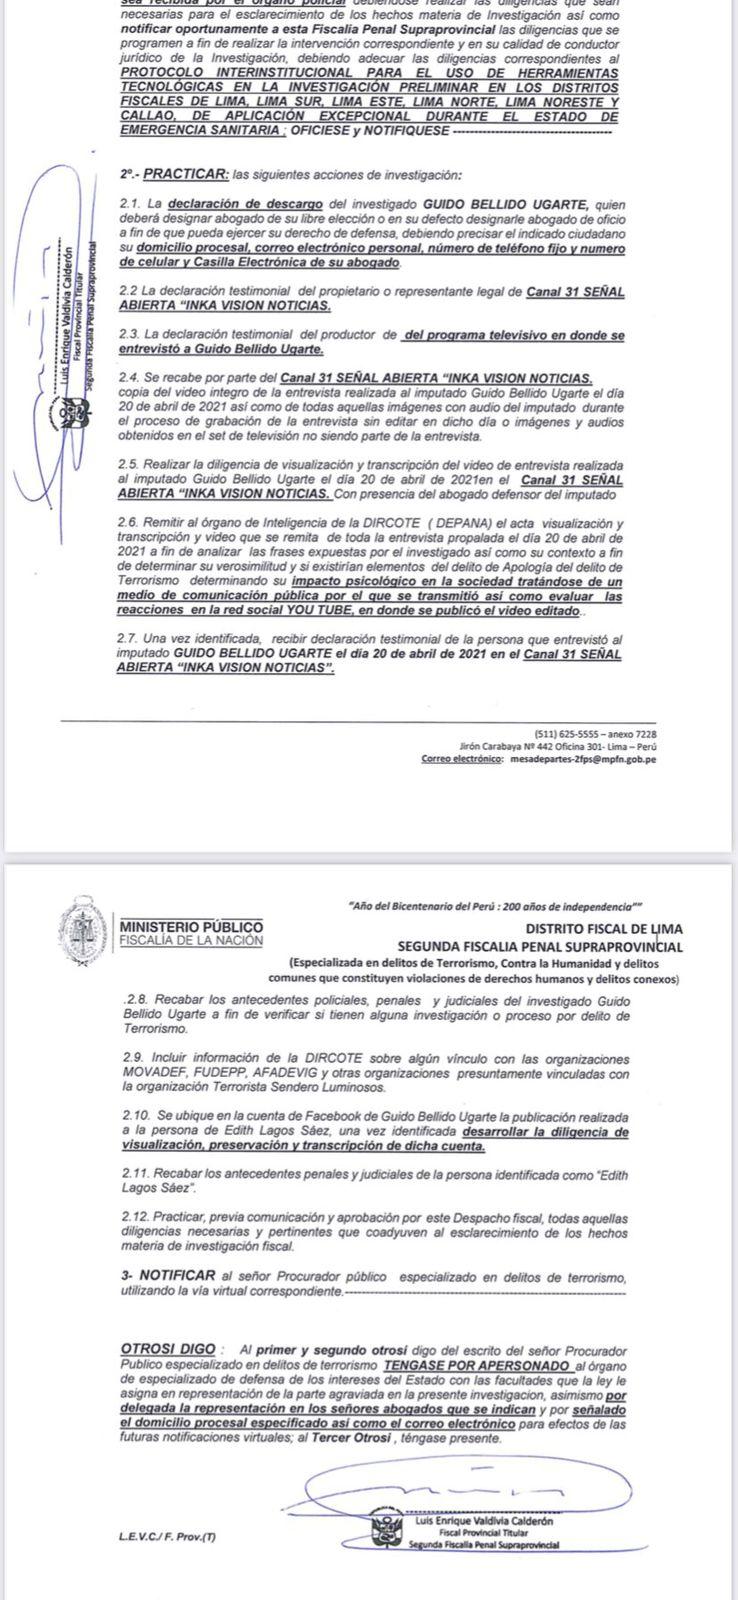 investigacion-guido-bellido2.jpeg